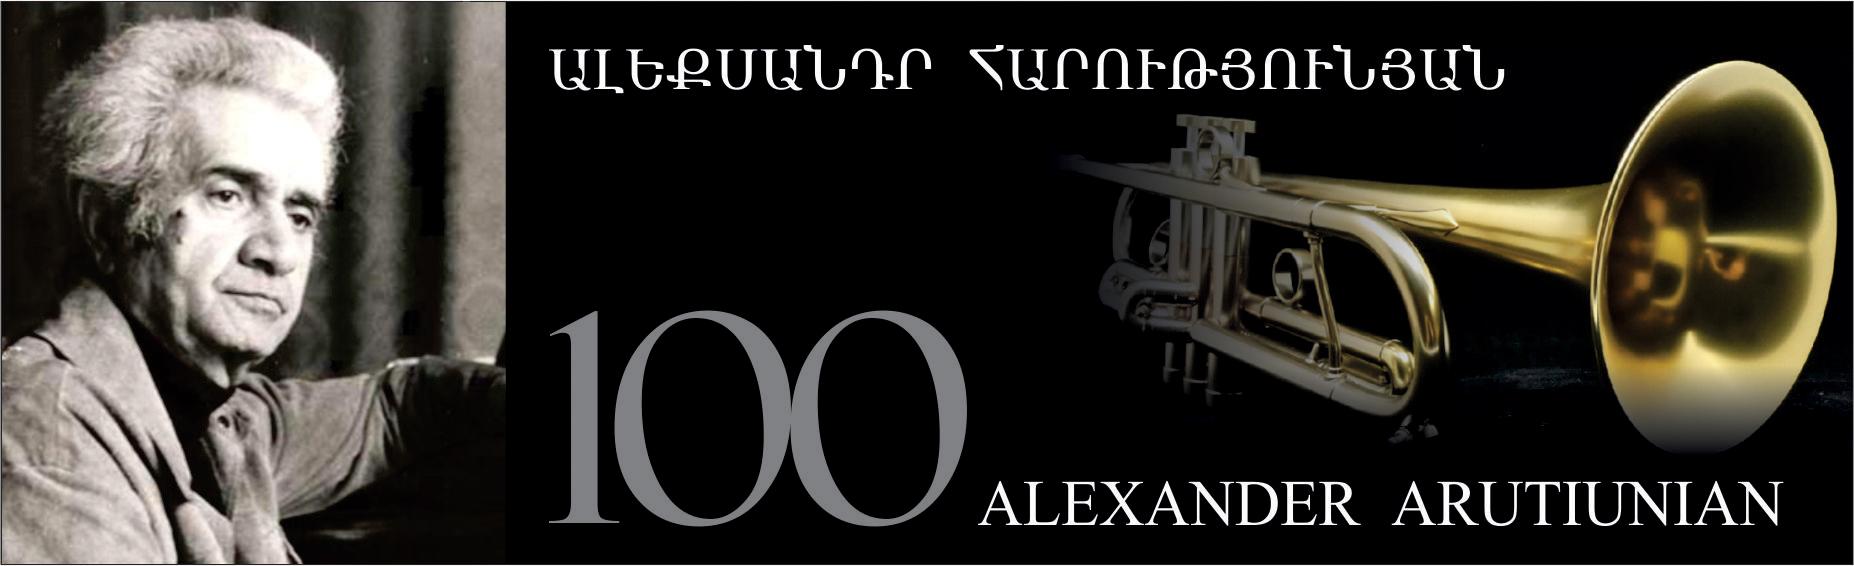 Alexander Arutiunian